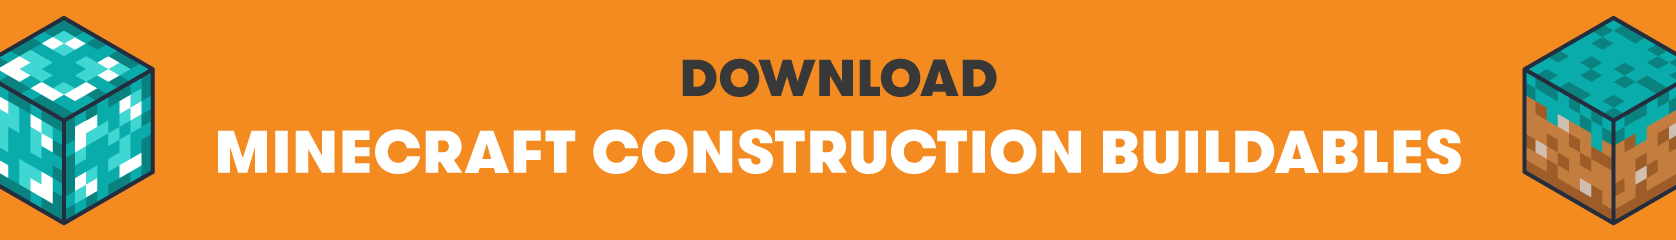 Download Minecraft construction block buildables